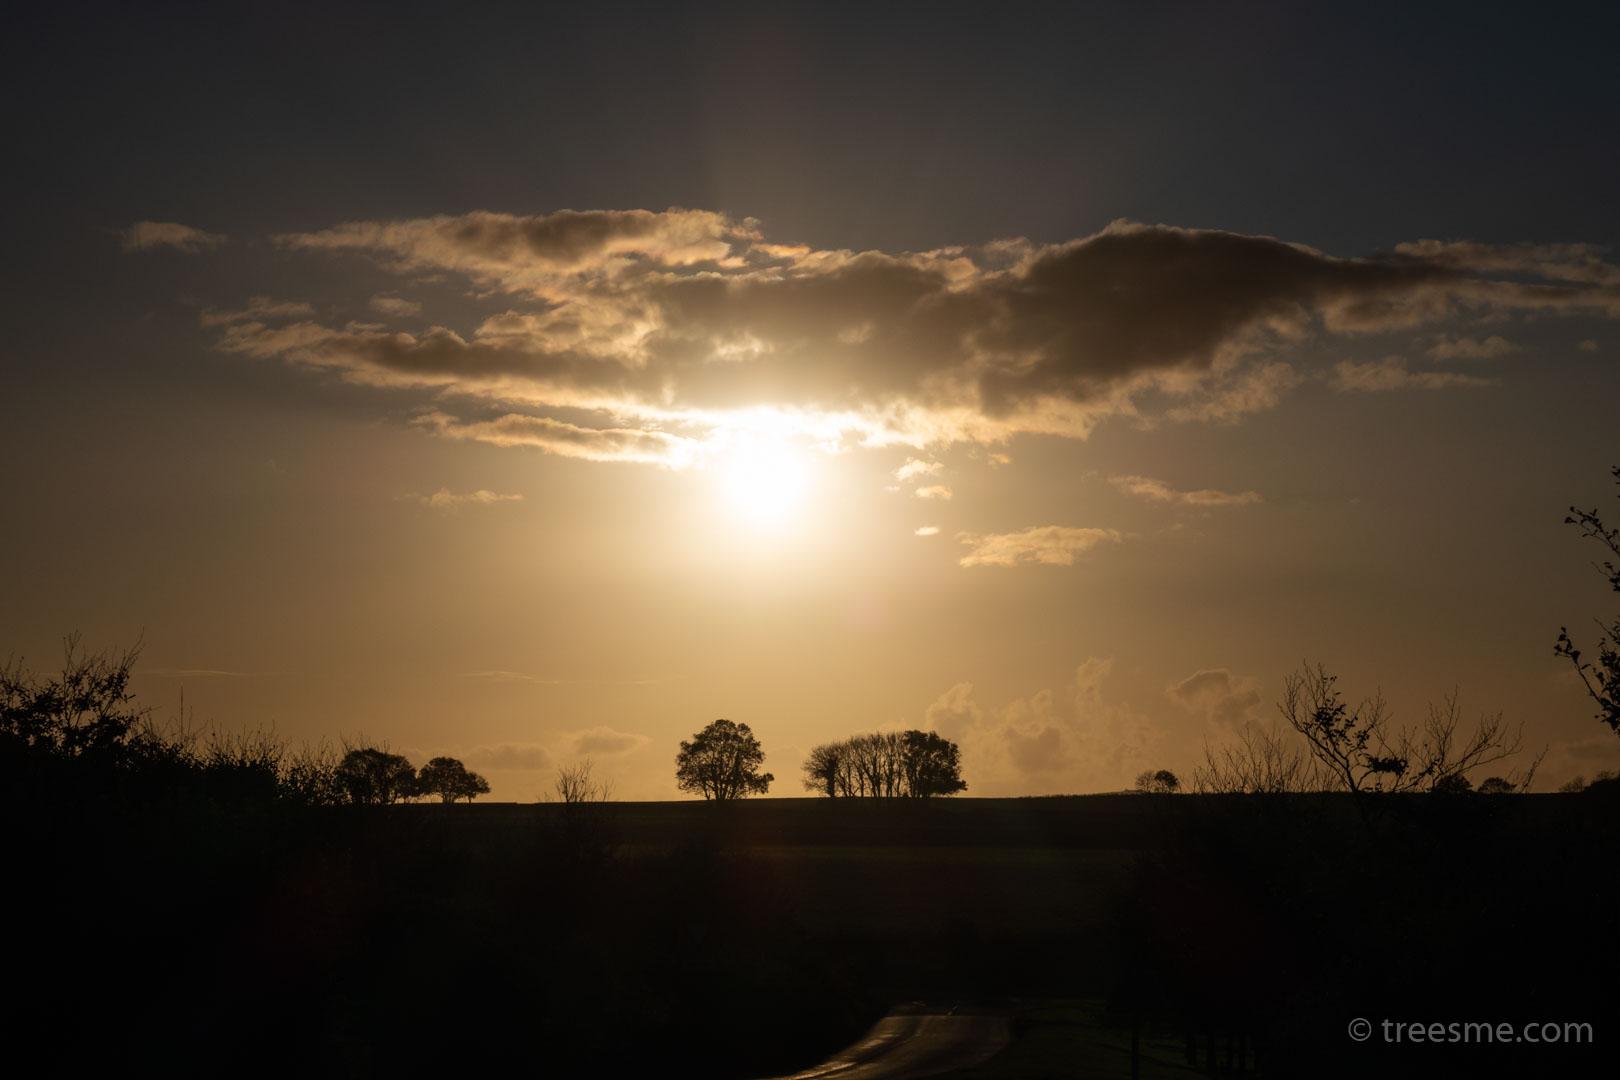 Autumn (October) – The Evening Sun and Light Cloud, Looking Towards Bodmin Moor